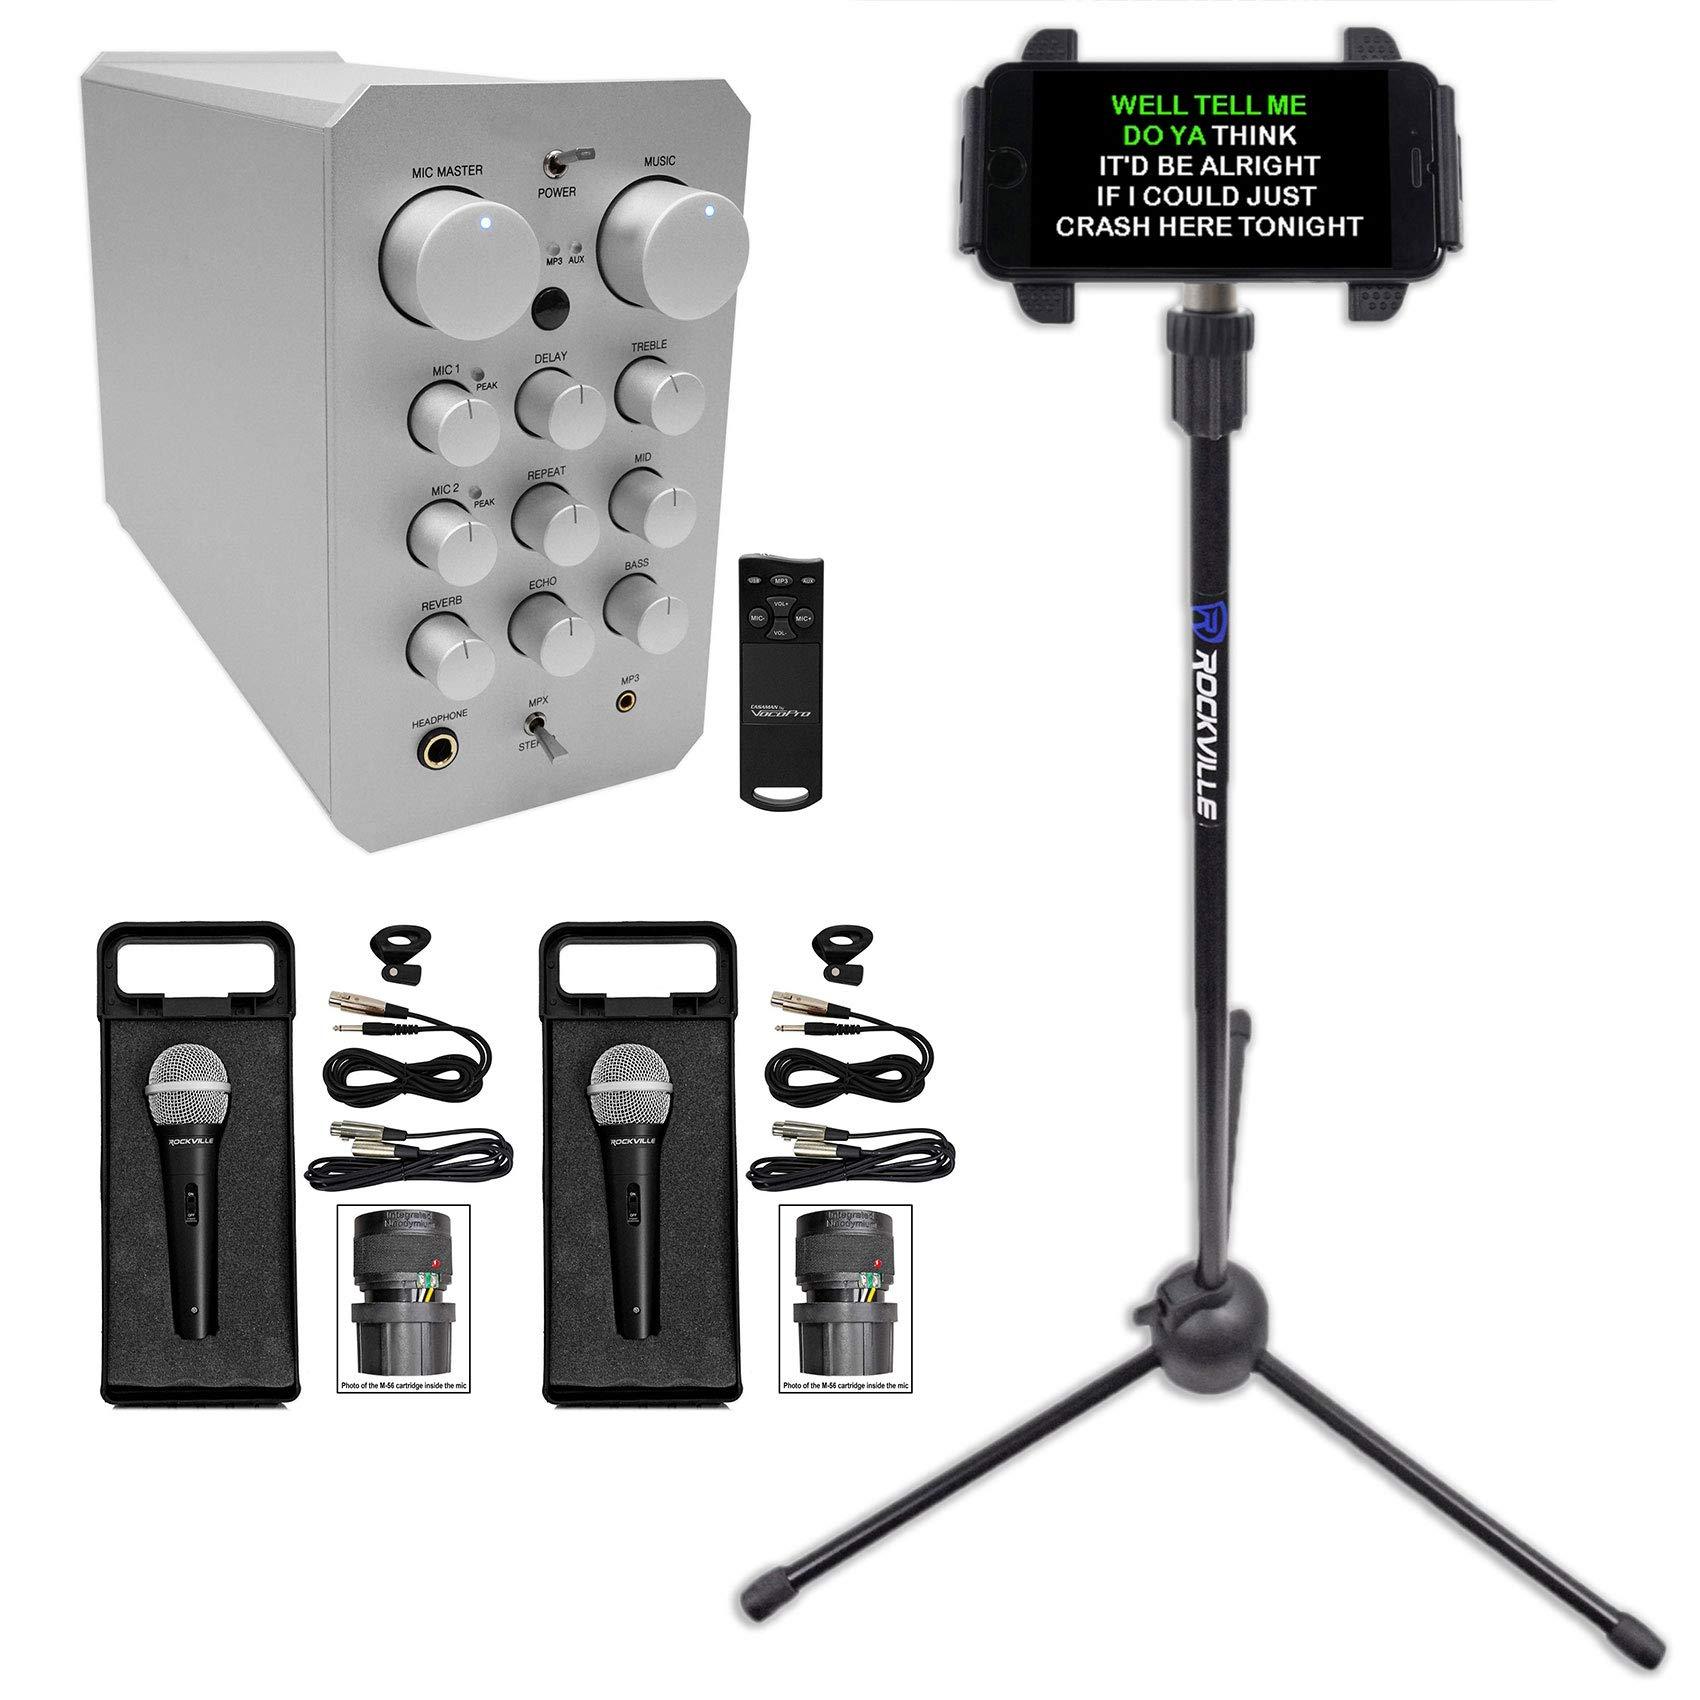 VOCOPRO CASAMAN 200w Digital Karaoke Powered Receiver Mixer+Tablet Stand+2) Mics